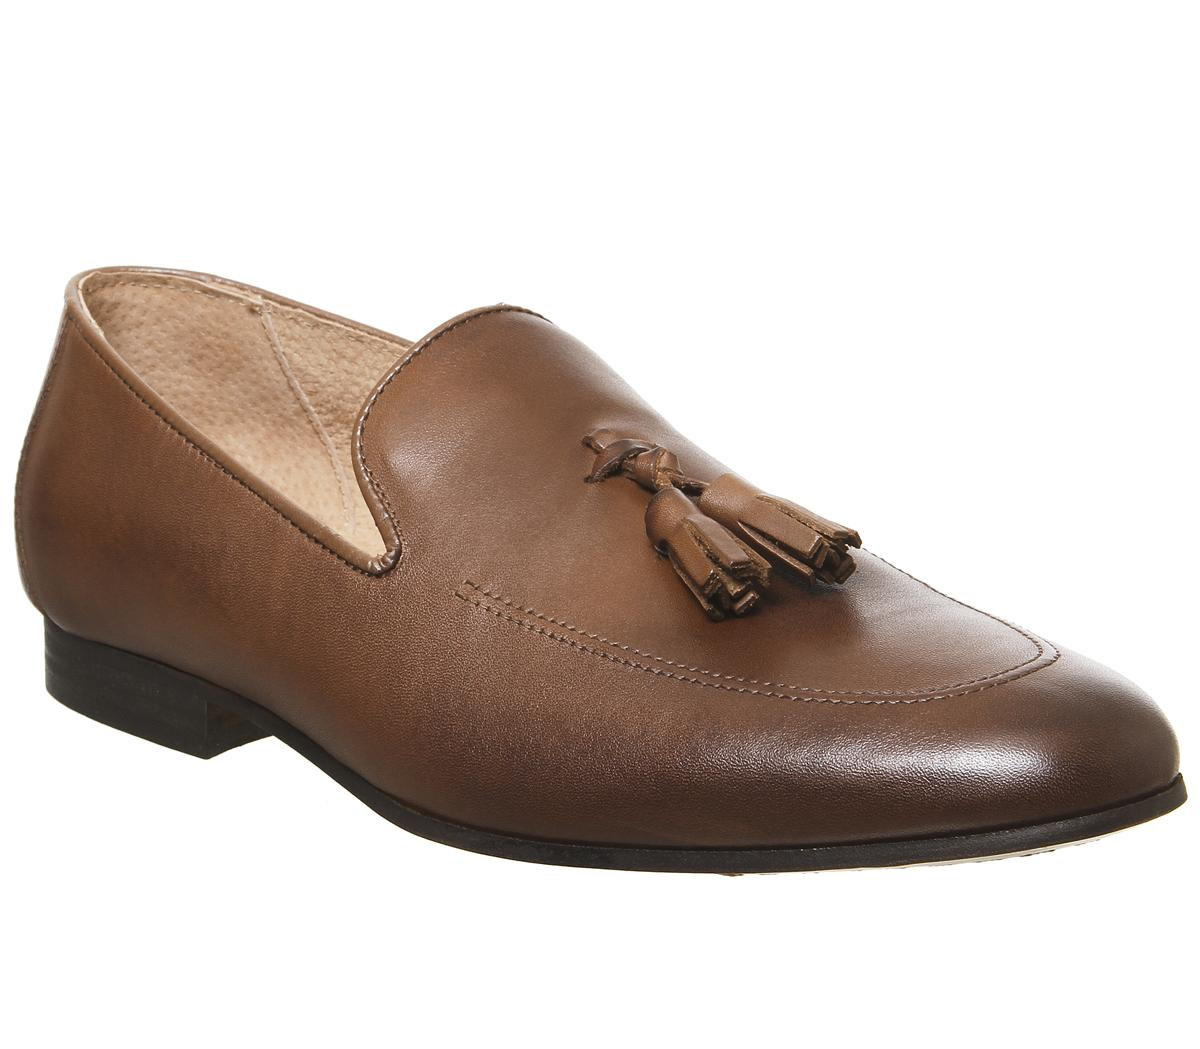 Manta Tassel Loafers